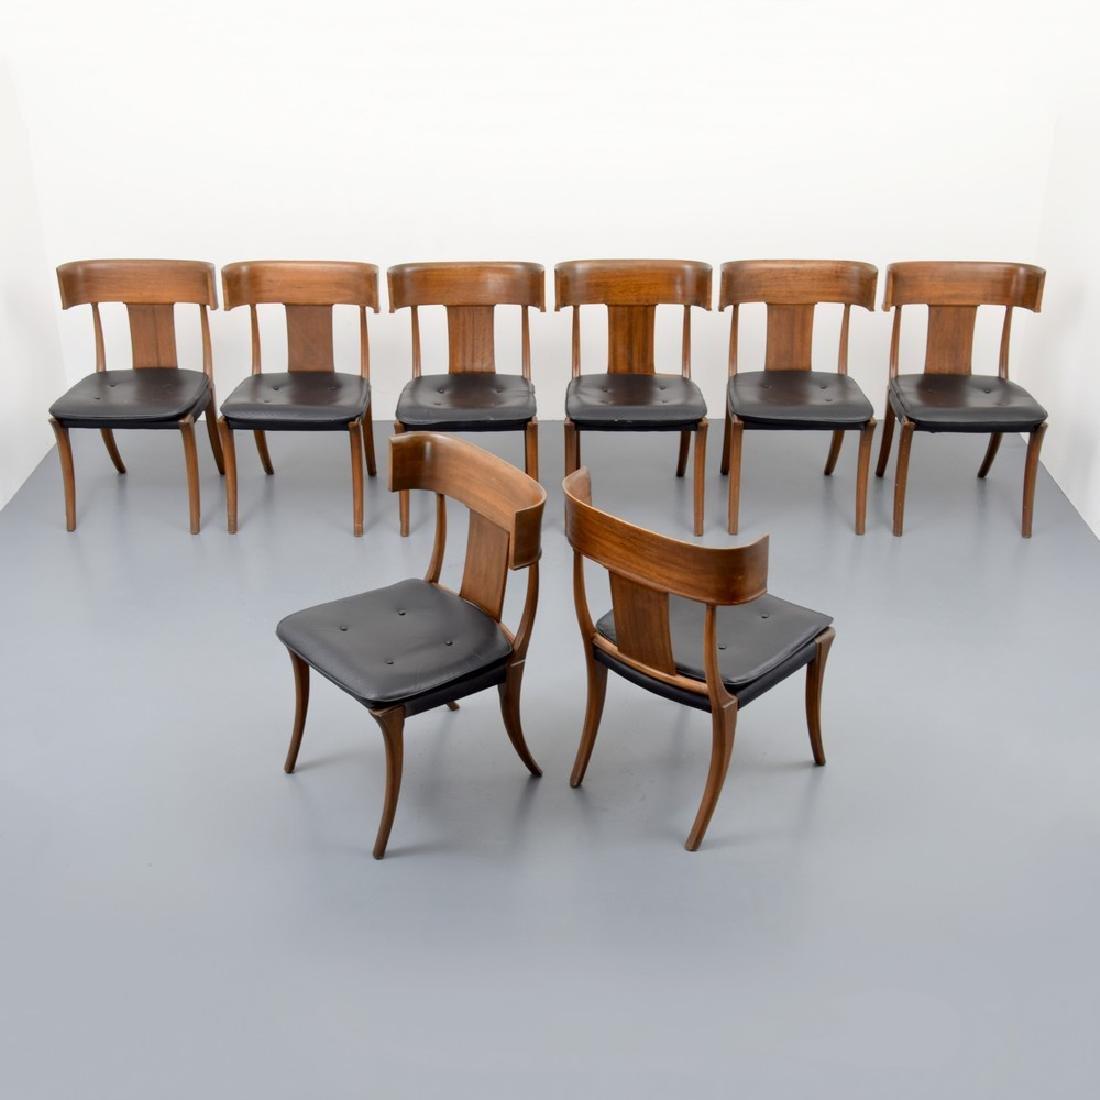 "Stewart & MacDougall ""Klismos"" Dining Chairs, Set of 8"